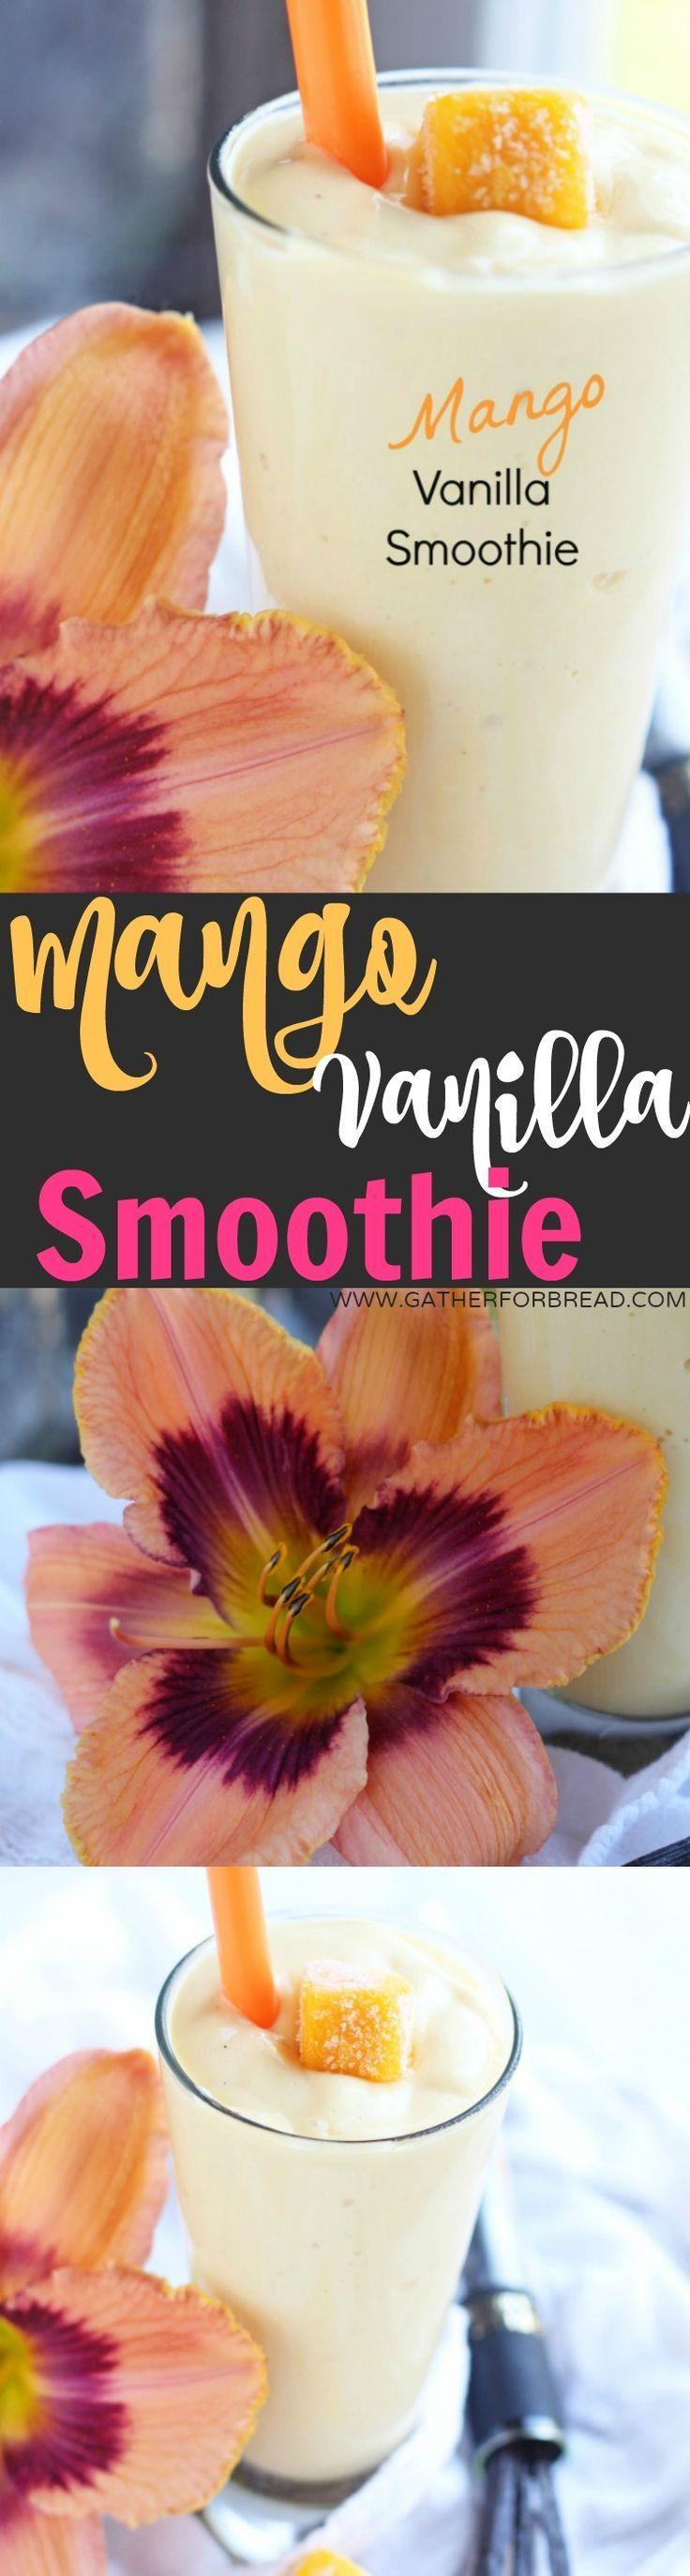 Mango Vanilla Smoothie - Healthy mango smoothie made with Greek yogurt, vanilla and frozen mango. Only 4 ingredients! Delicious protein for breakfast or snack.